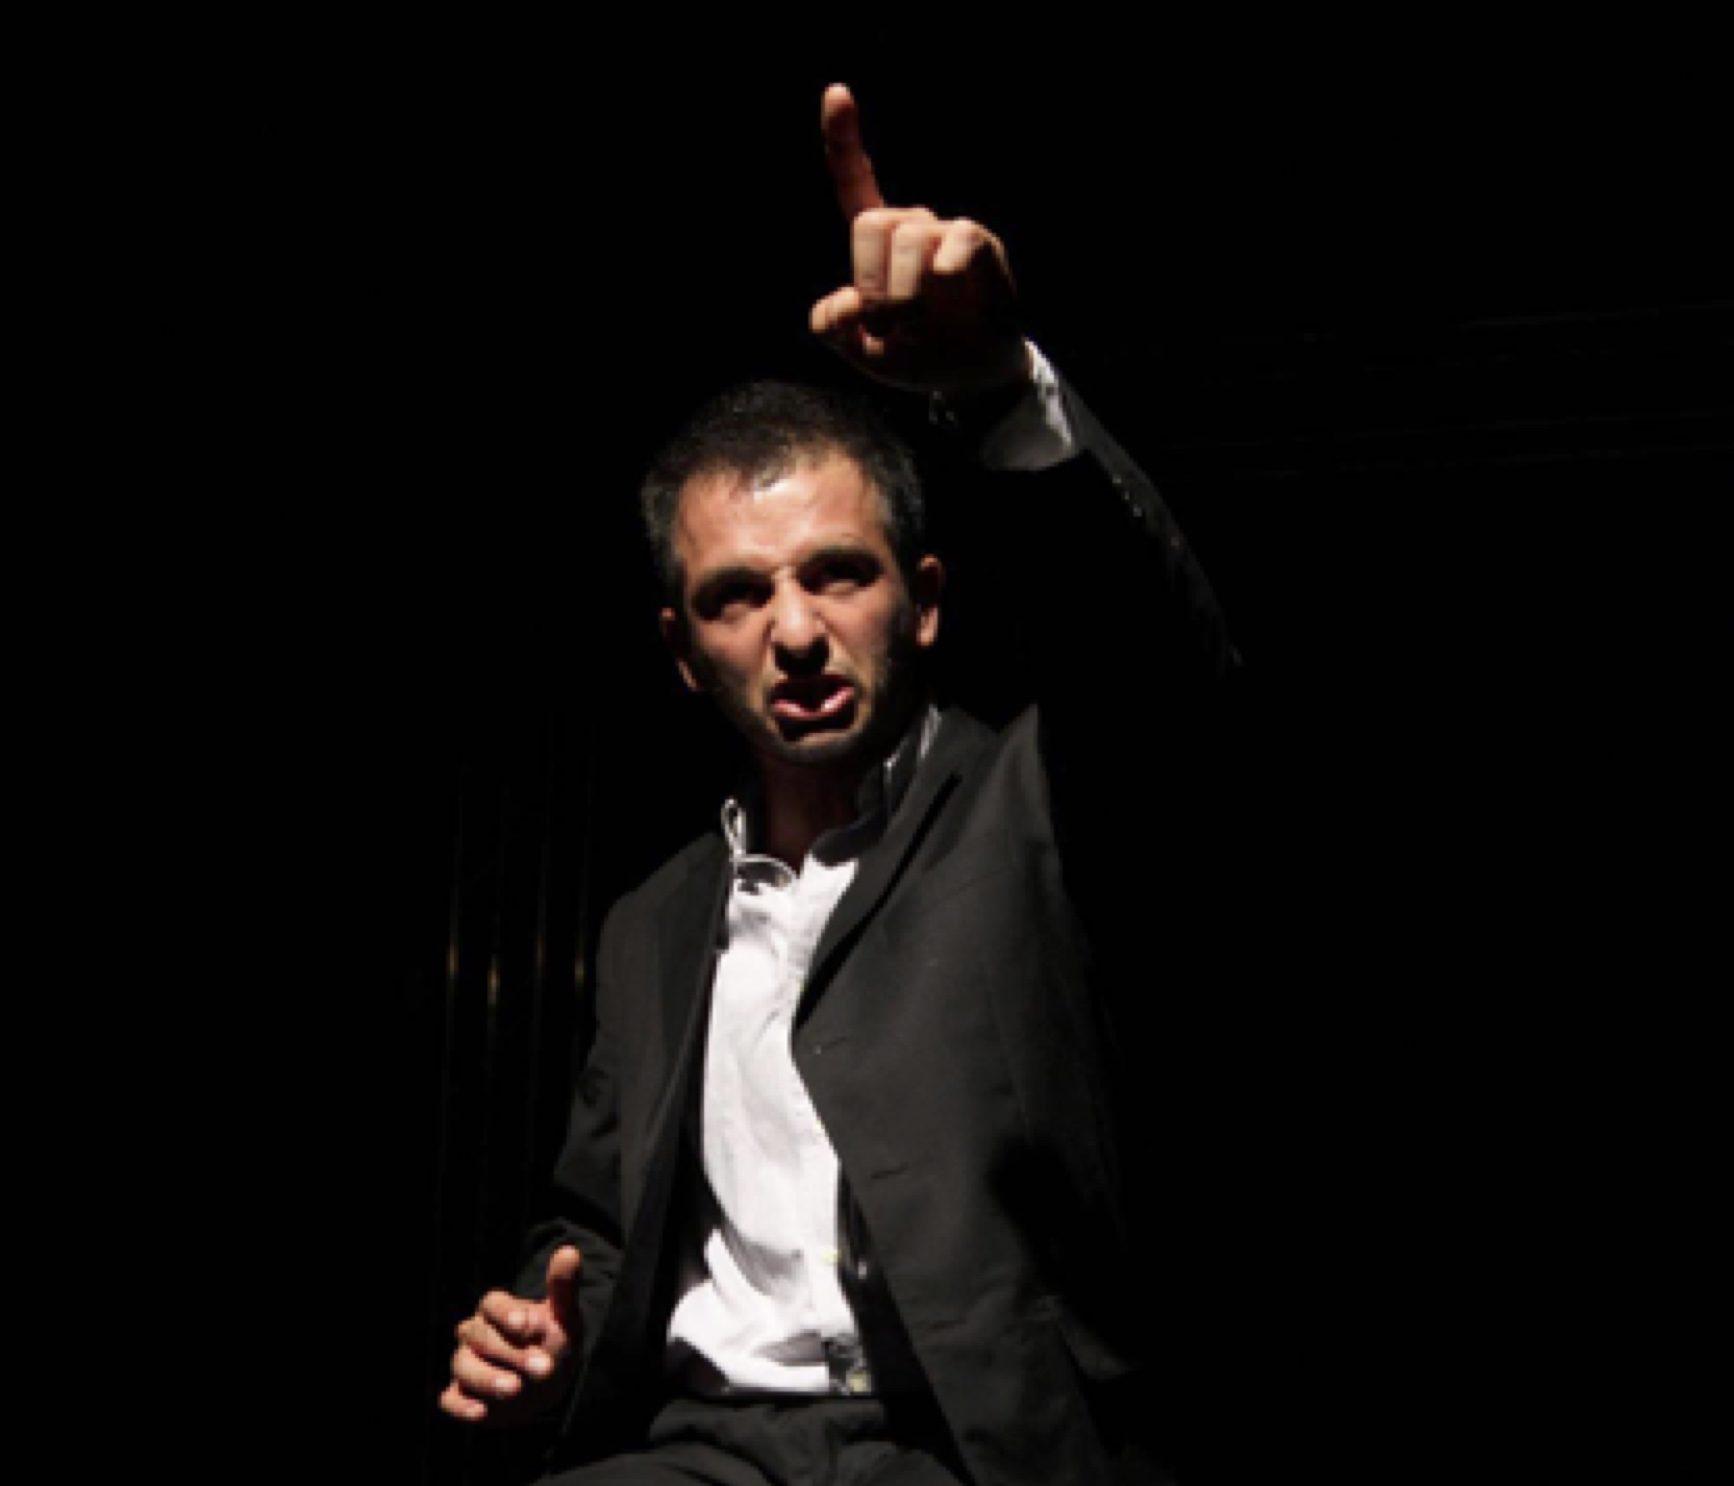 Giacomo Guarneri